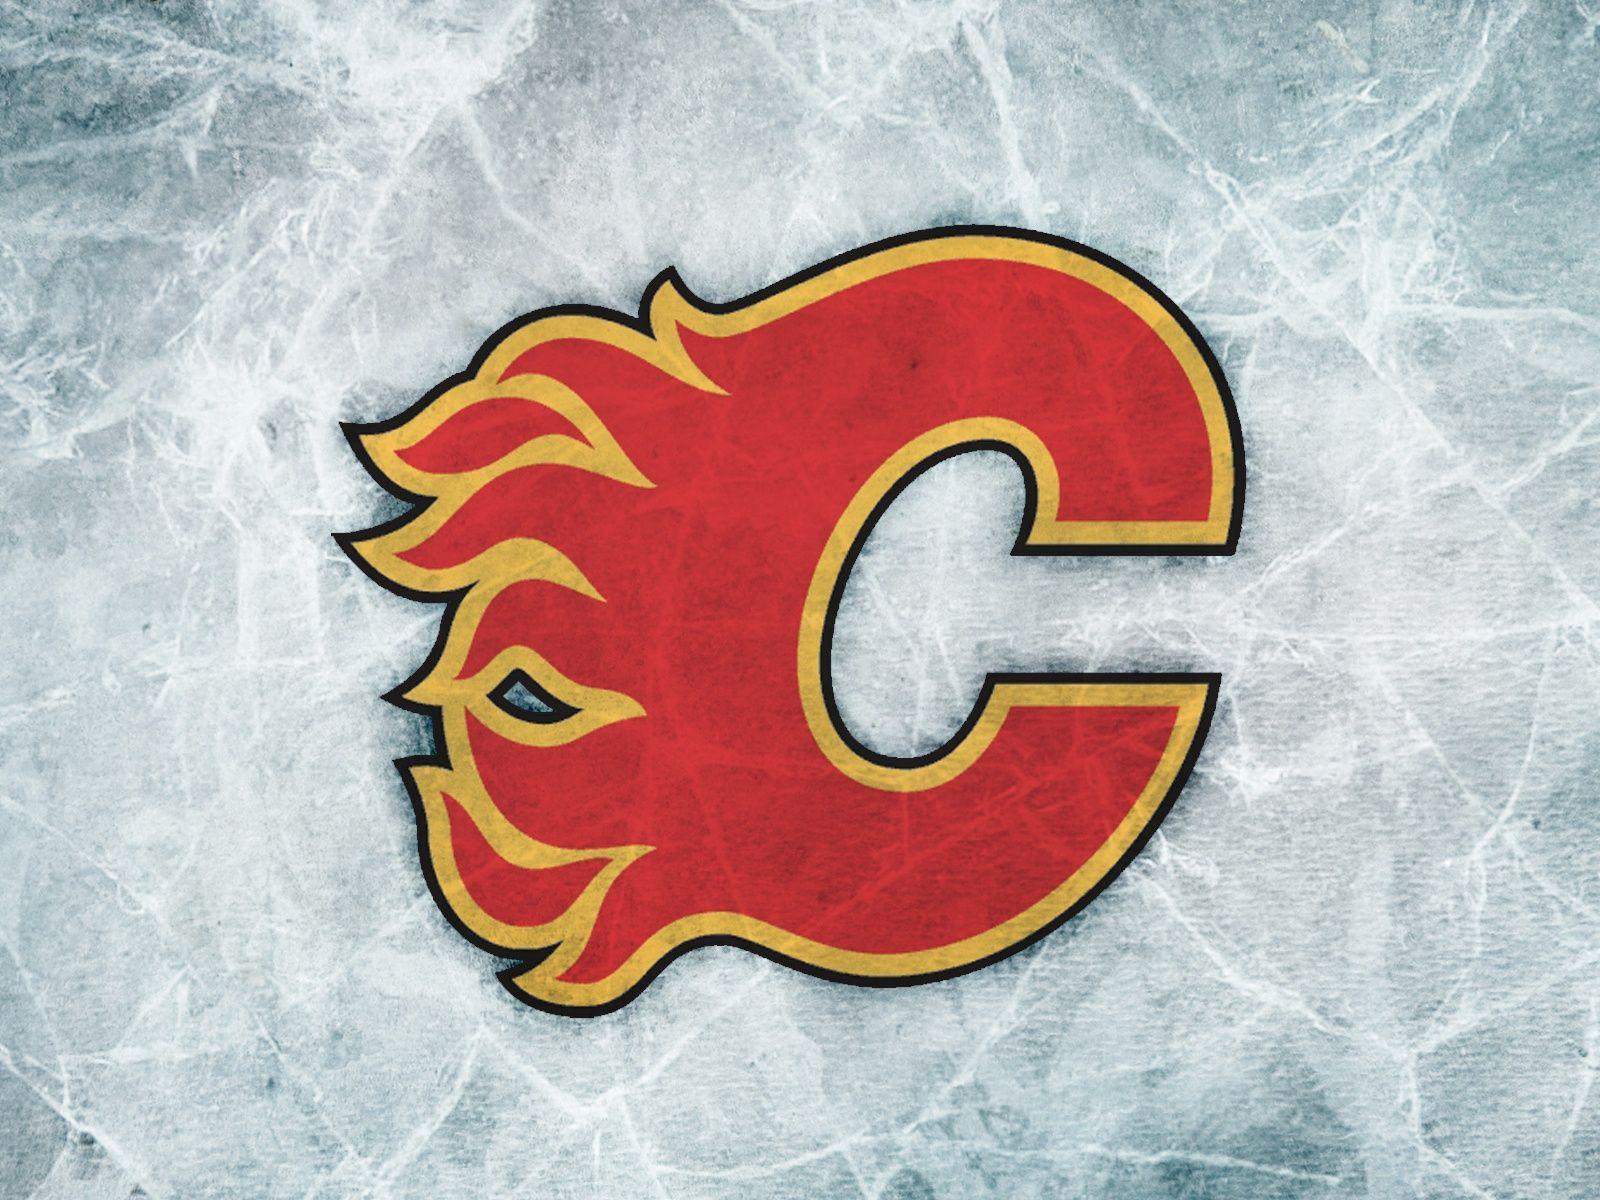 Calgary Flames Wallpapers Wallpaper Cave